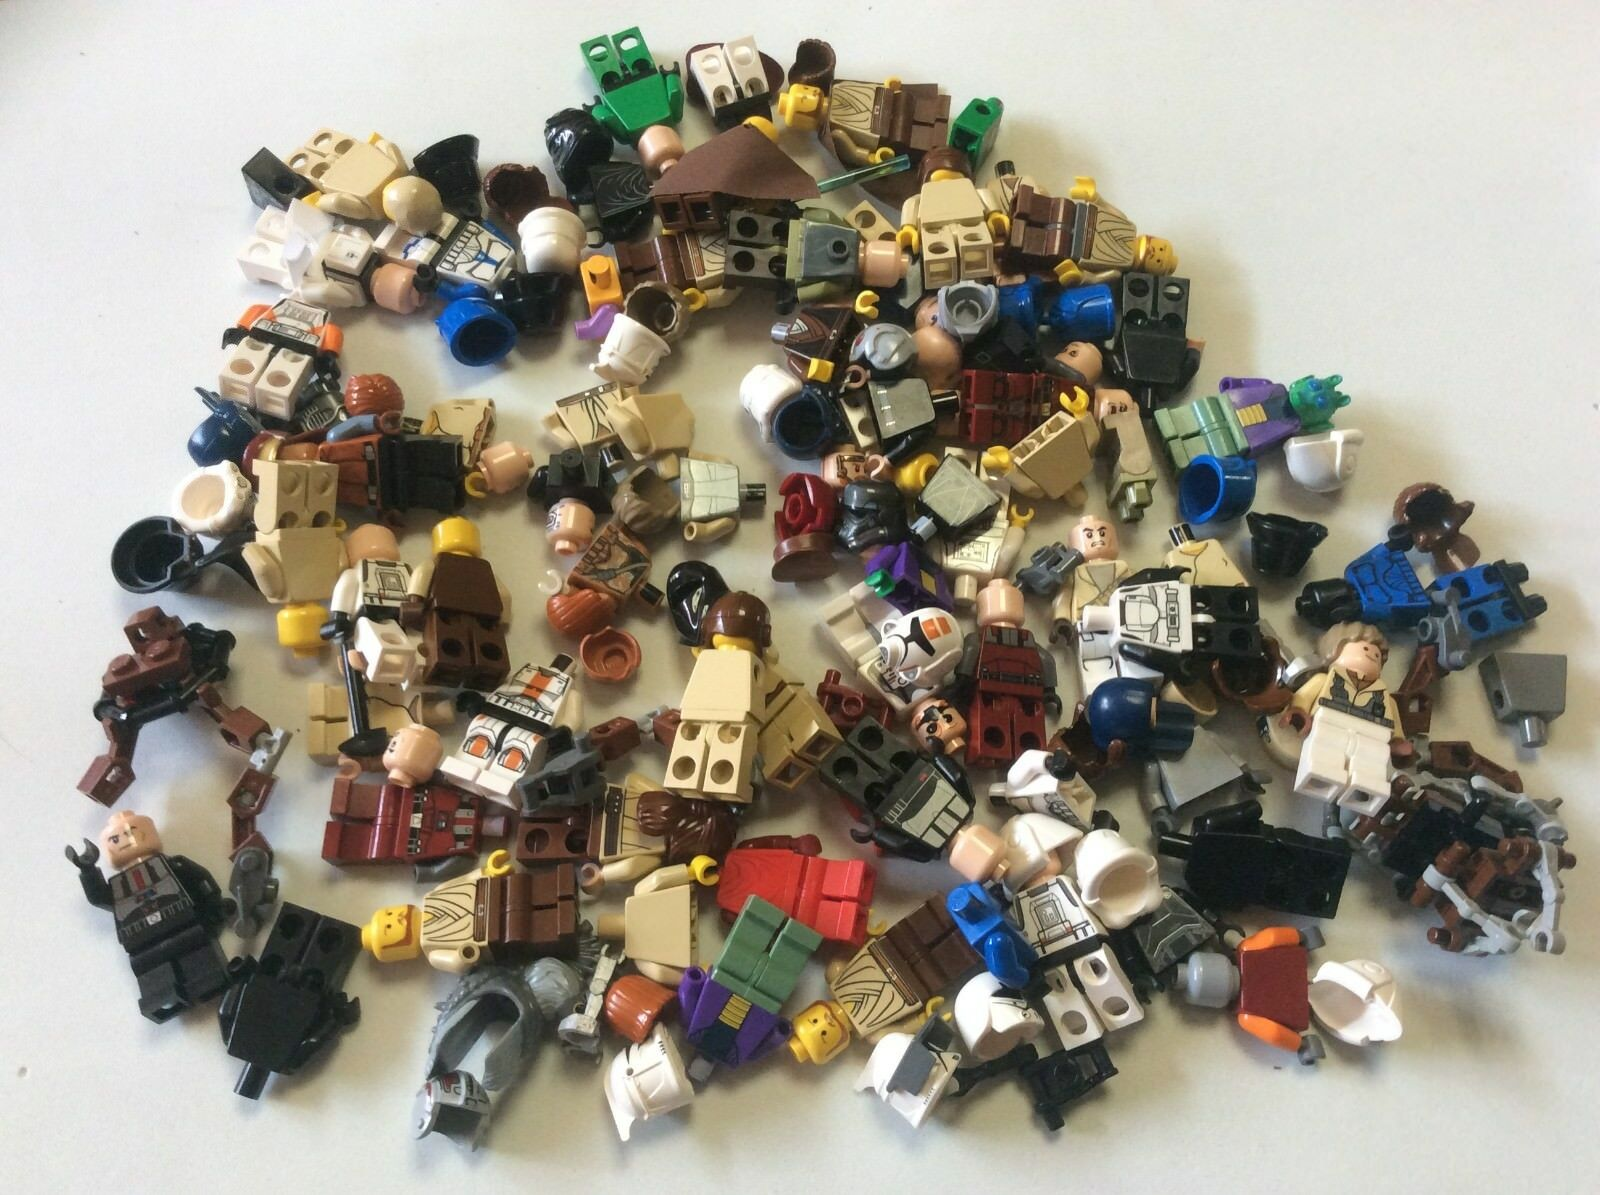 8 Ounces Lego Star Wars Minifig parts 1/2 Pound minifigures Lot X471B